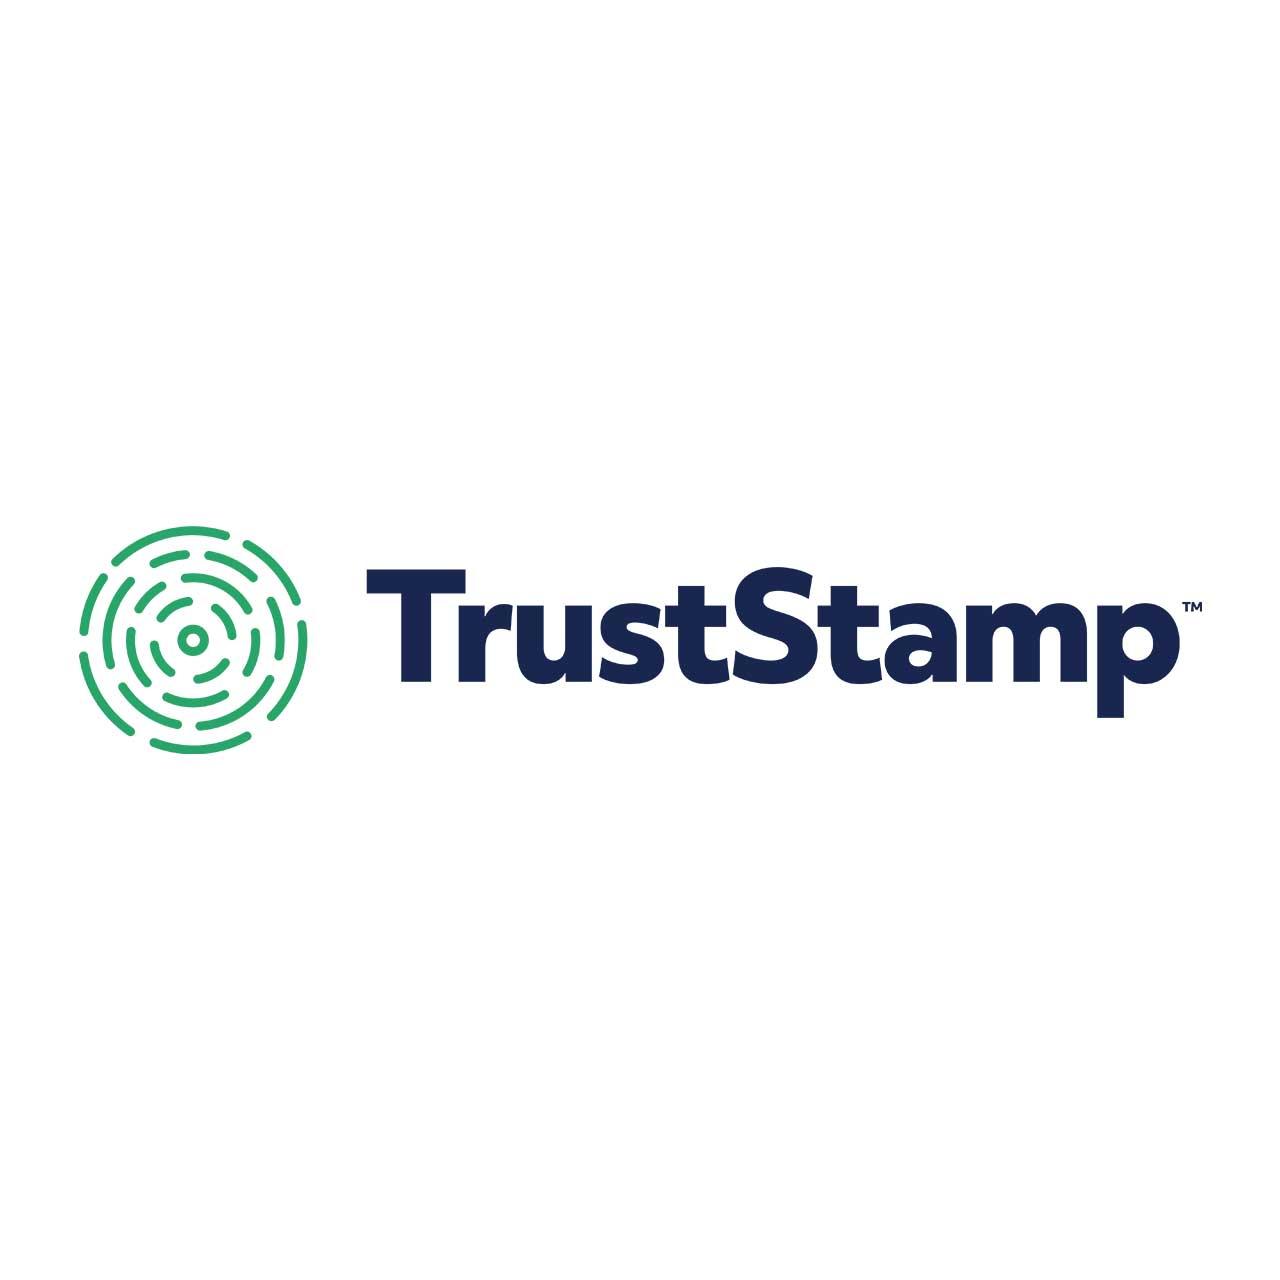 truststamp-squre-logo